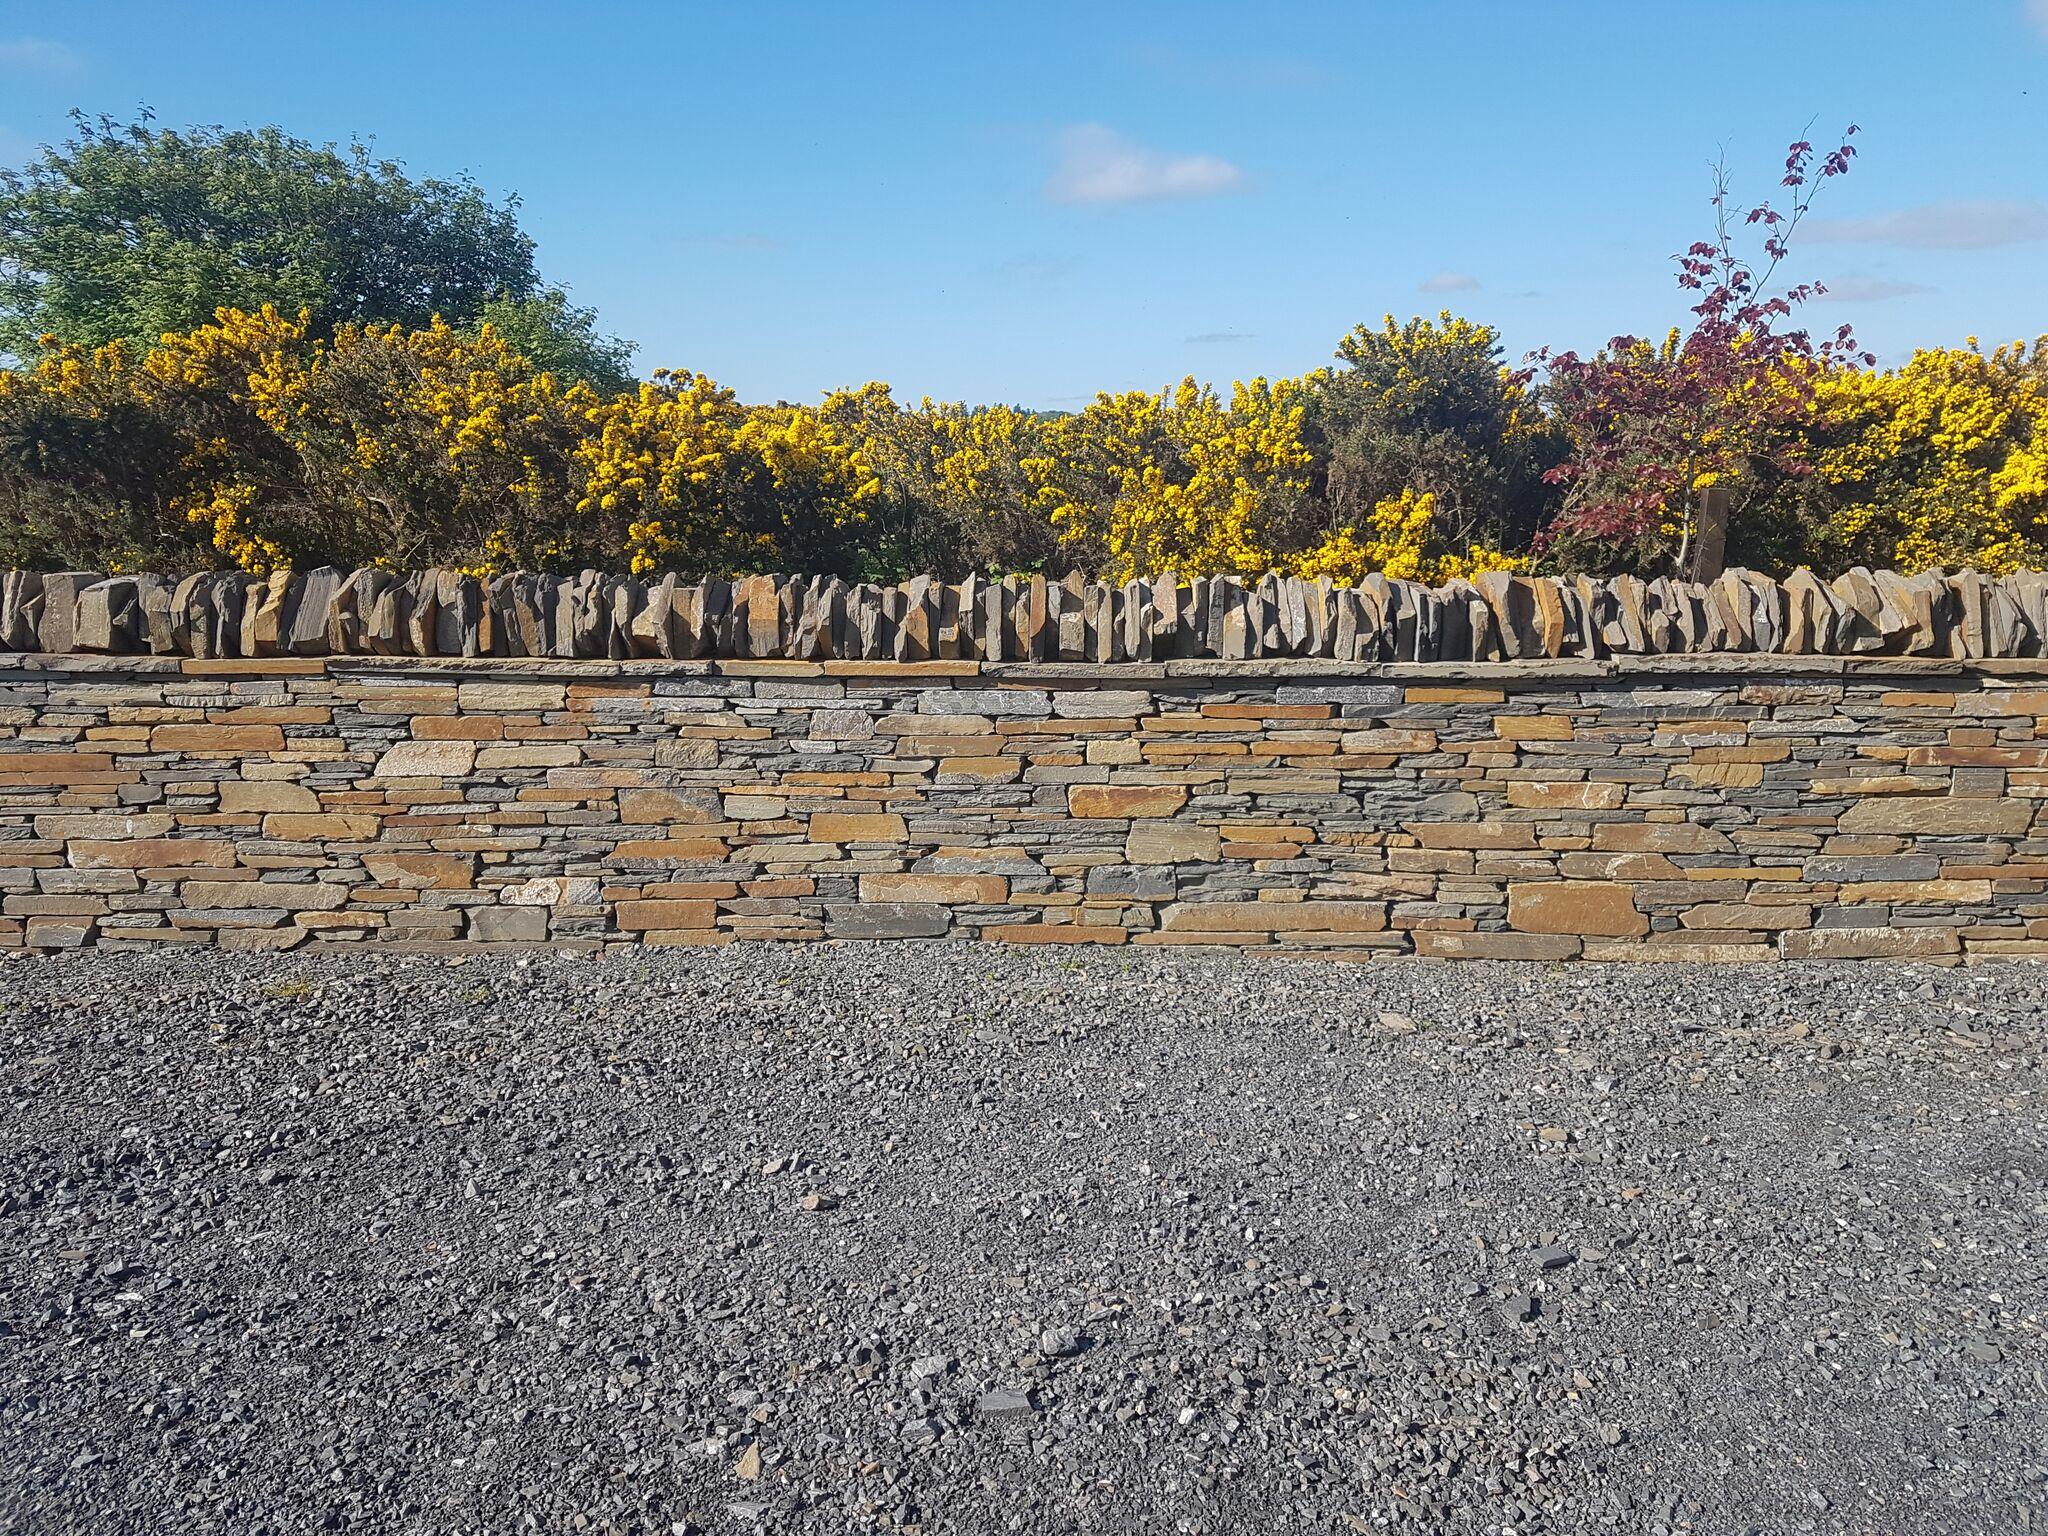 Caithness stone wall